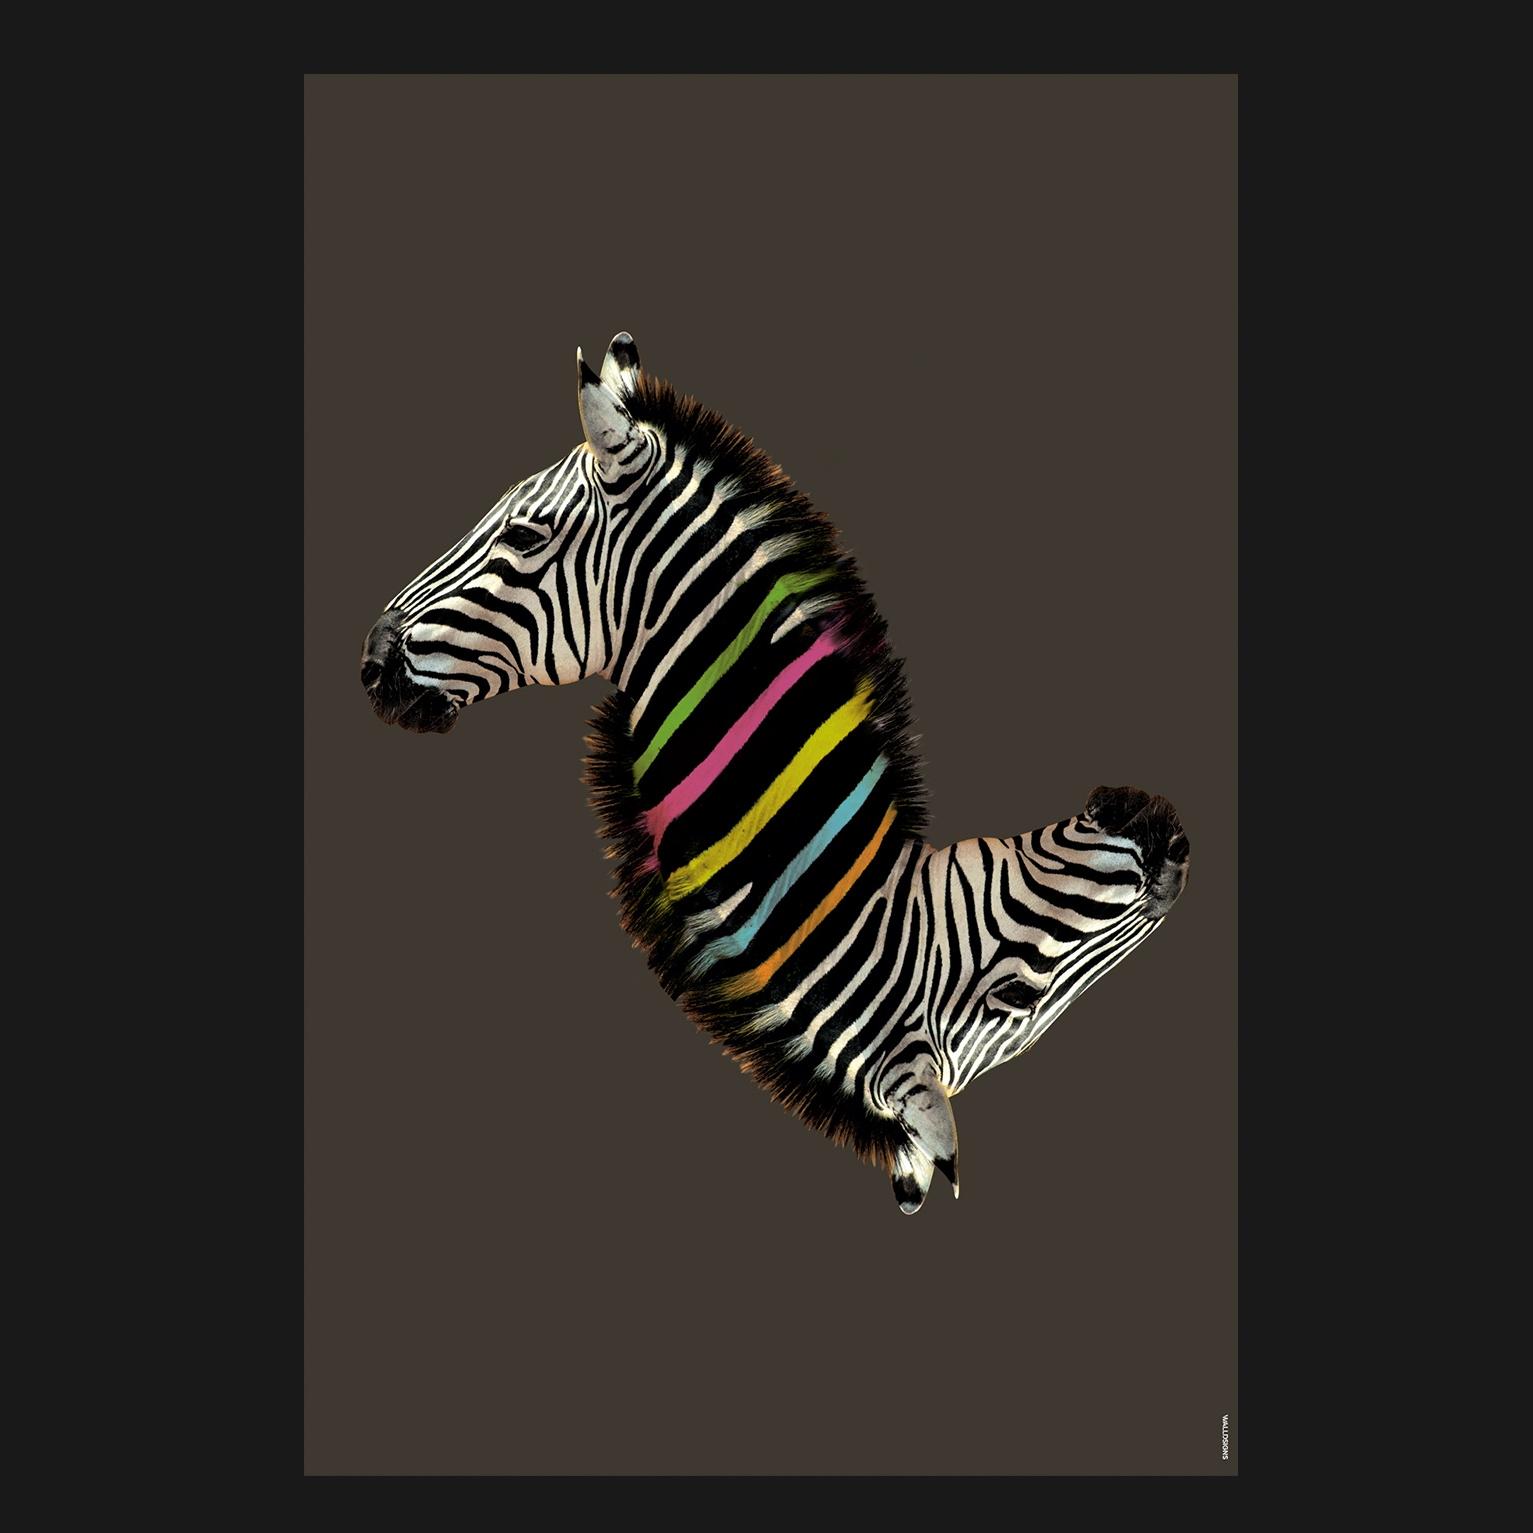 Rainbow Zebra Colorful   Walldsigns